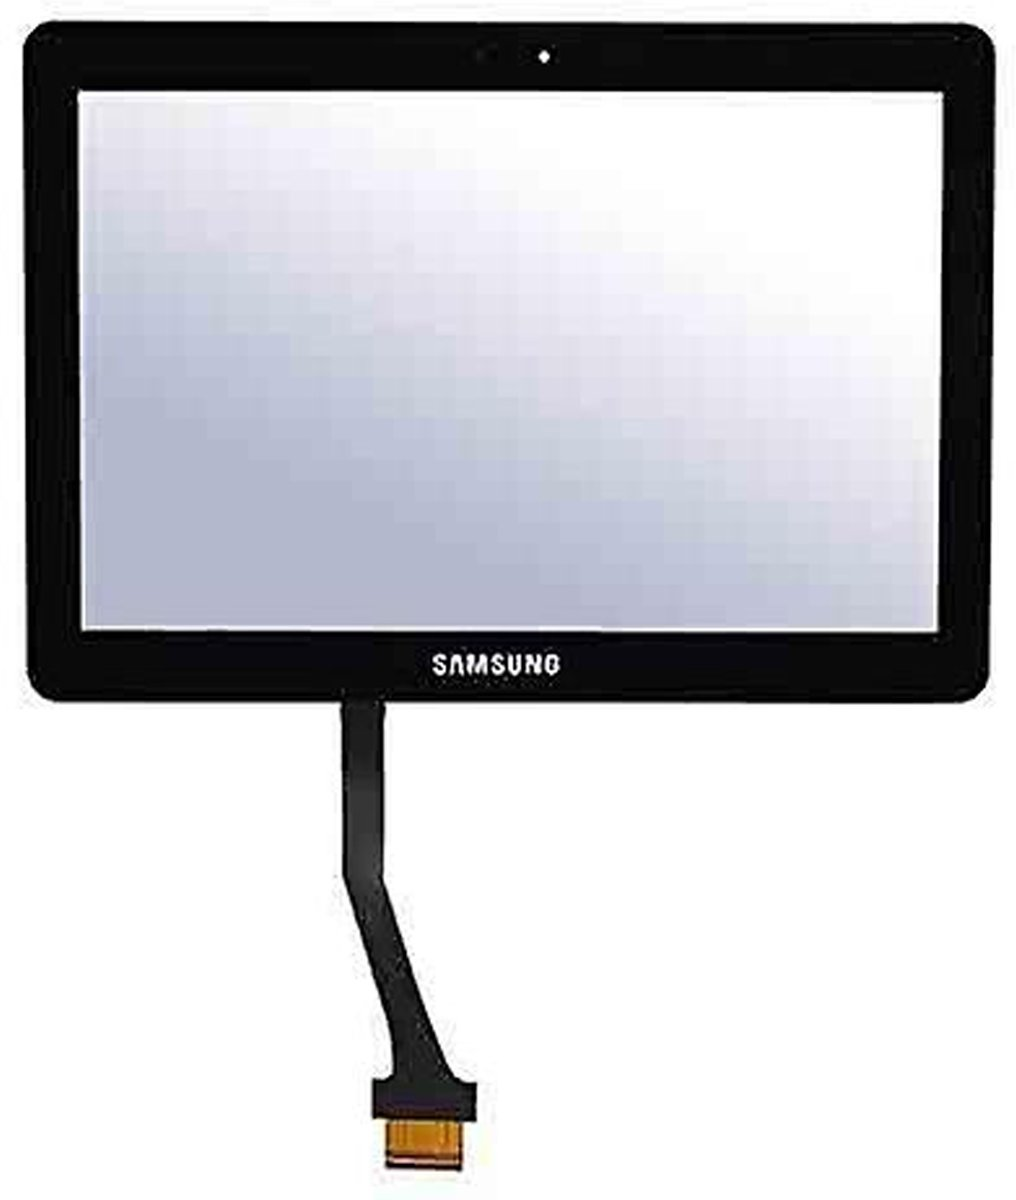 Touchscreen scherm digitizer glas voor Samsung Note Tablet 10.1 N8000 N8010 N8013 Compleet - Zwart kopen